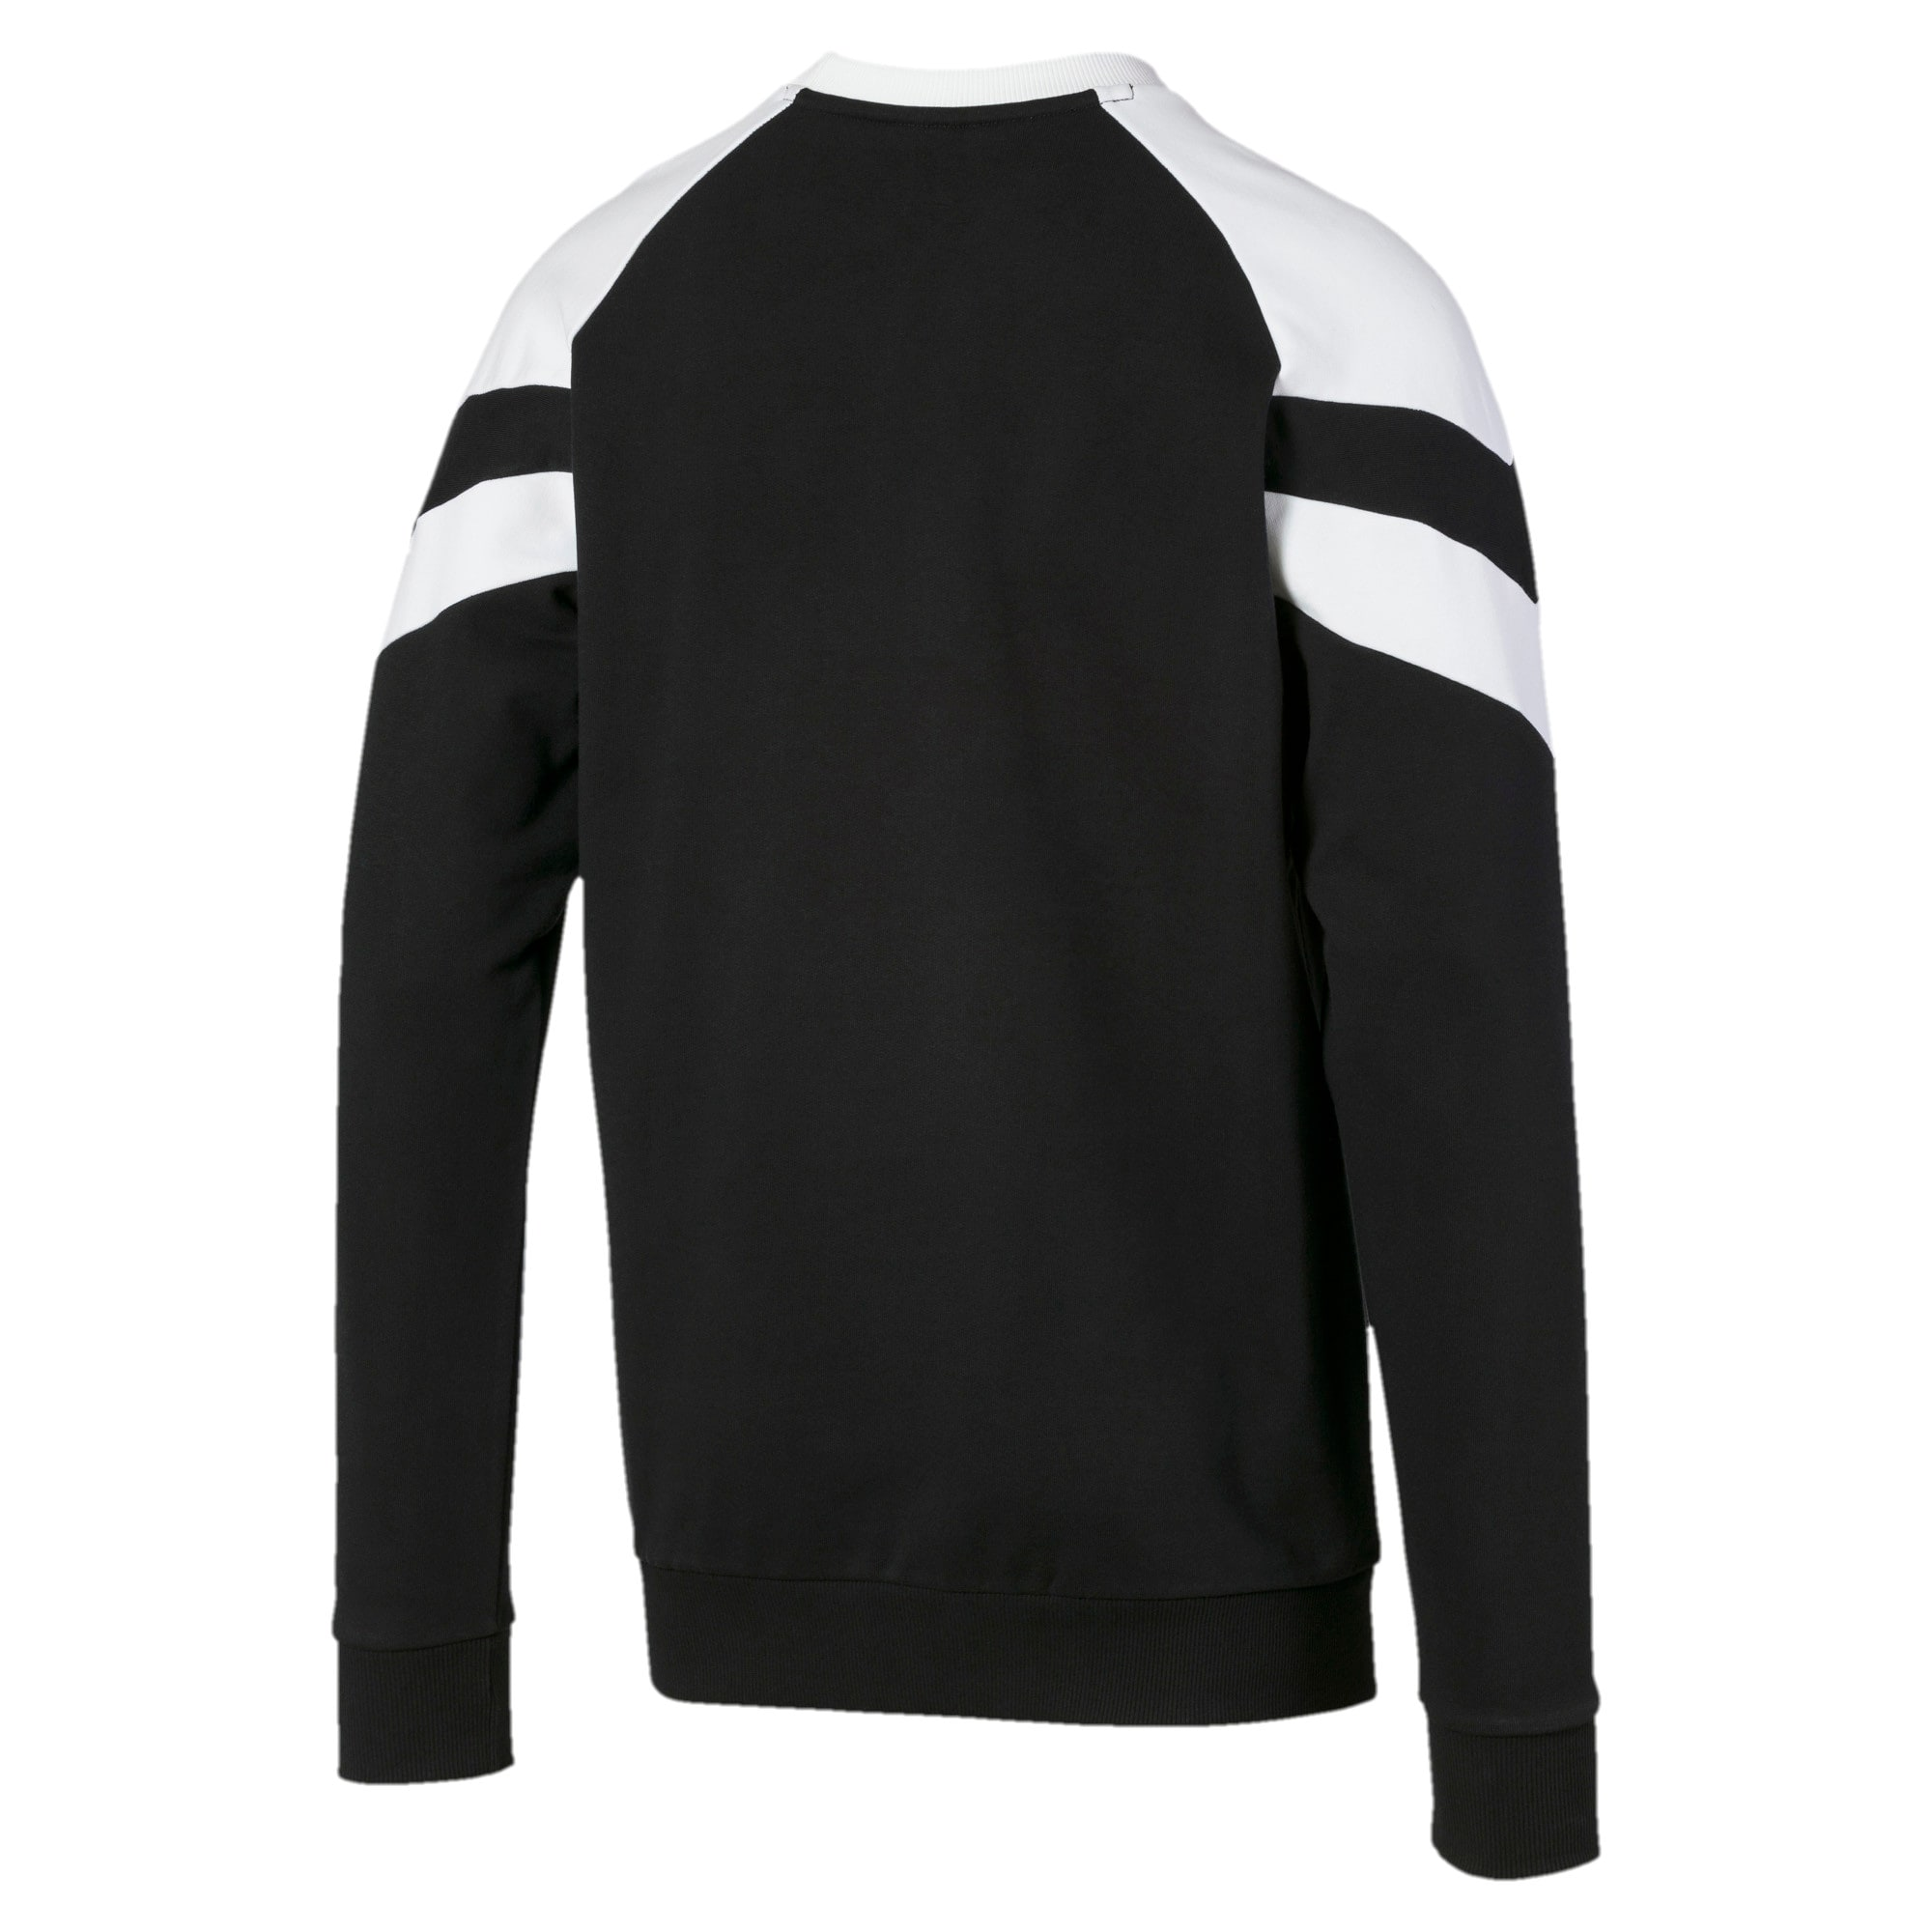 Thumbnail 5 of Jersey con cuello redondo de hombre Iconic MCS, Puma Black, medium